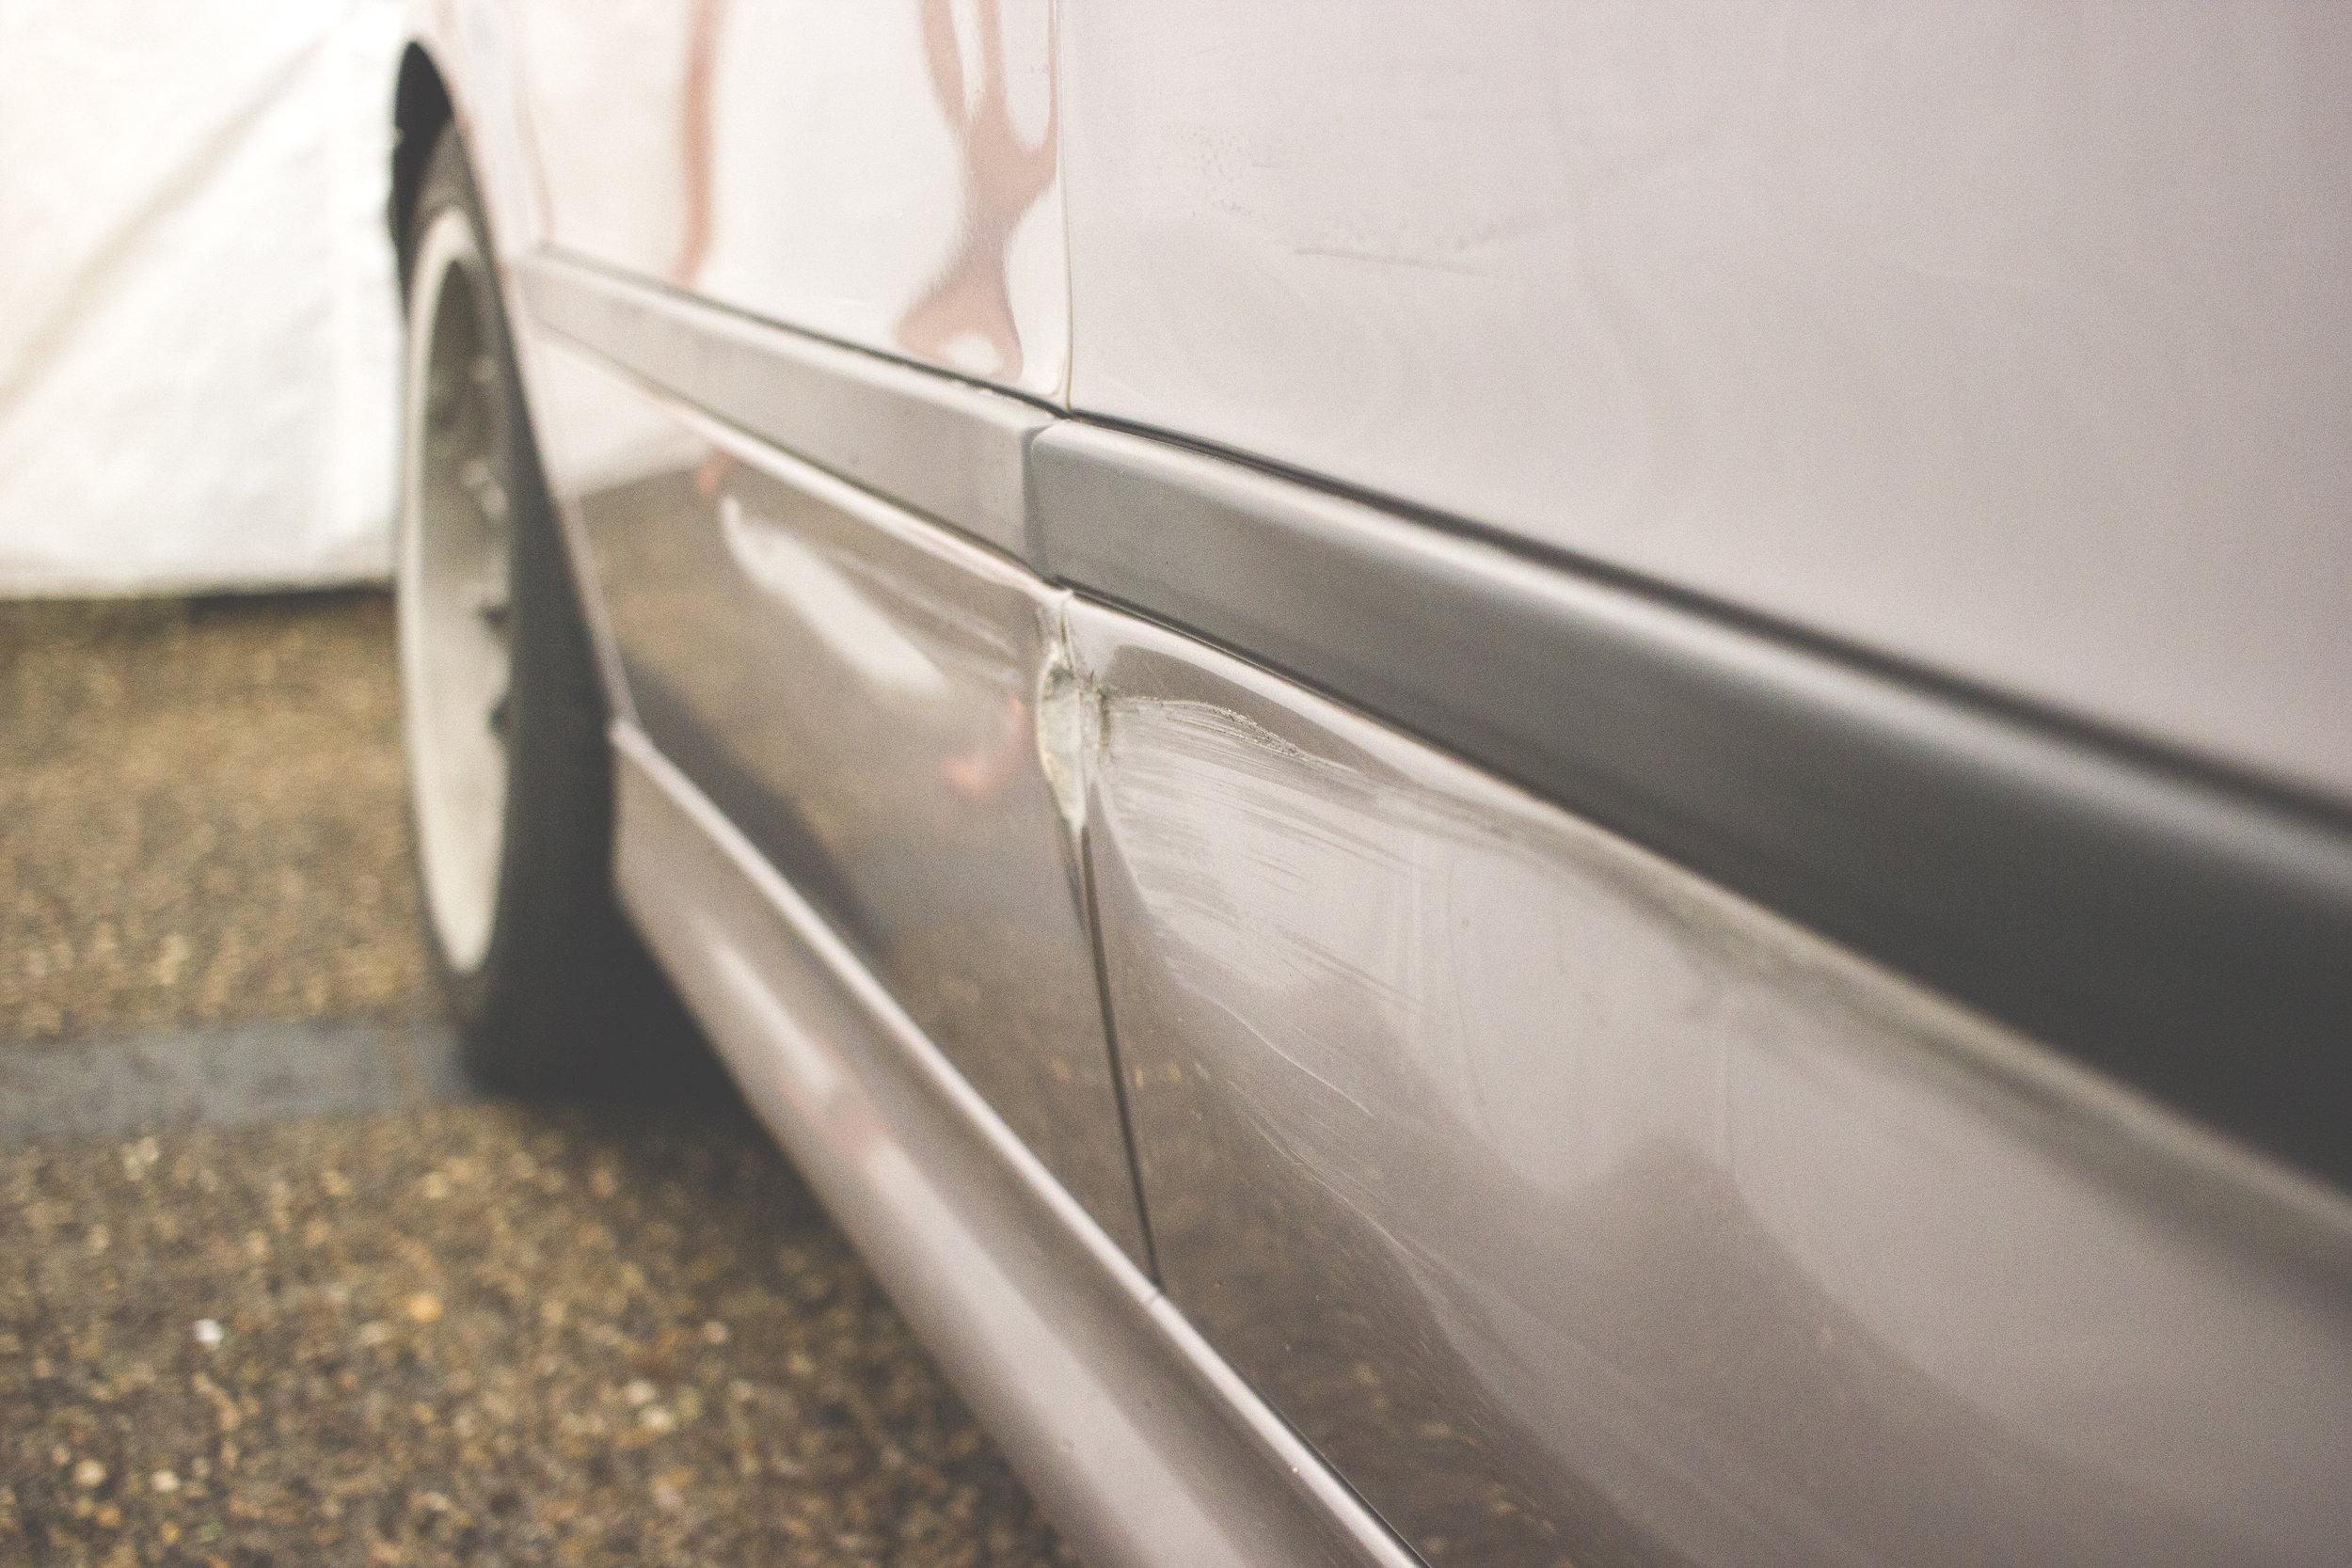 Mömus BMW E39 Exterior Door Scratches Dent Repair